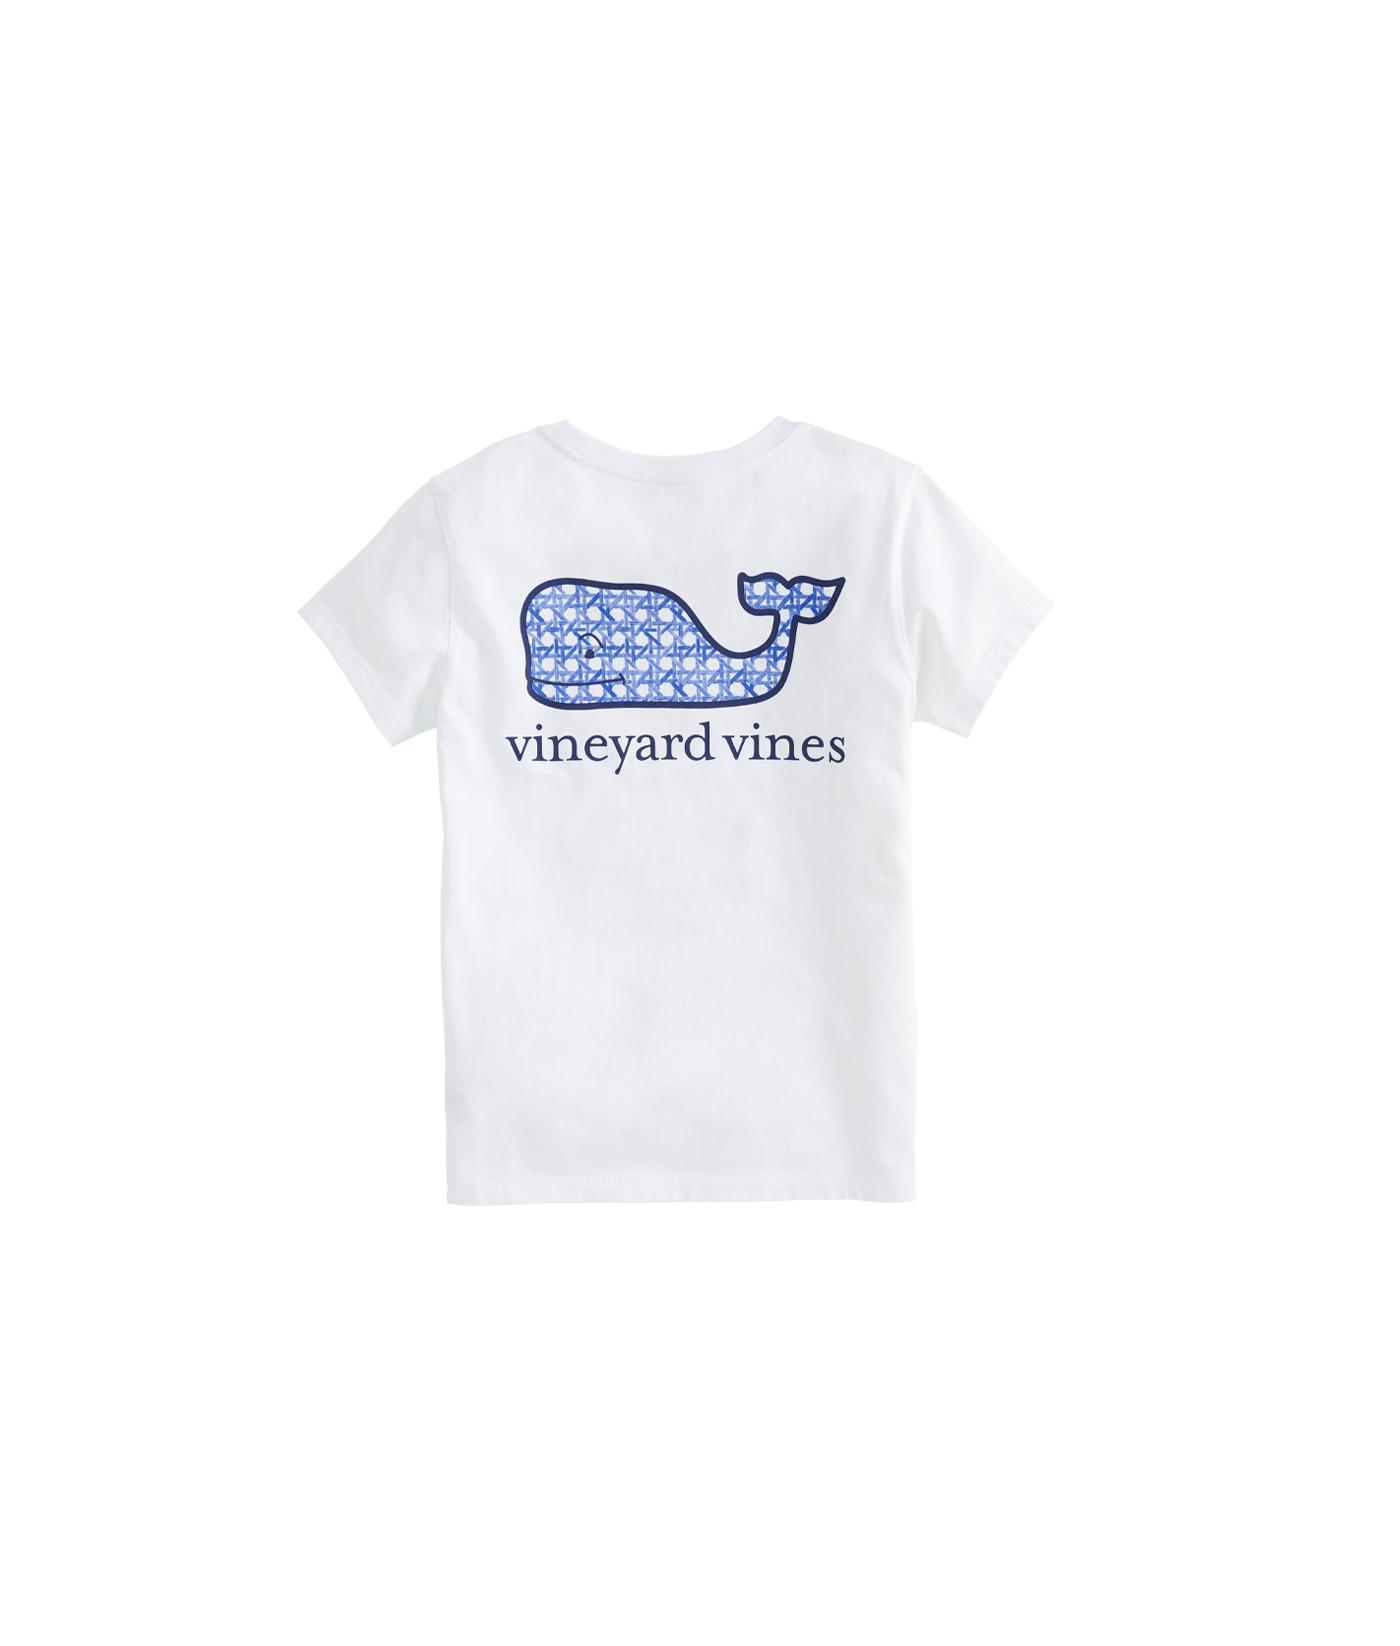 Vineyard Vines Boys White Cap Soccer Whale Graphic Short Sleeve Pocket T-Shirt